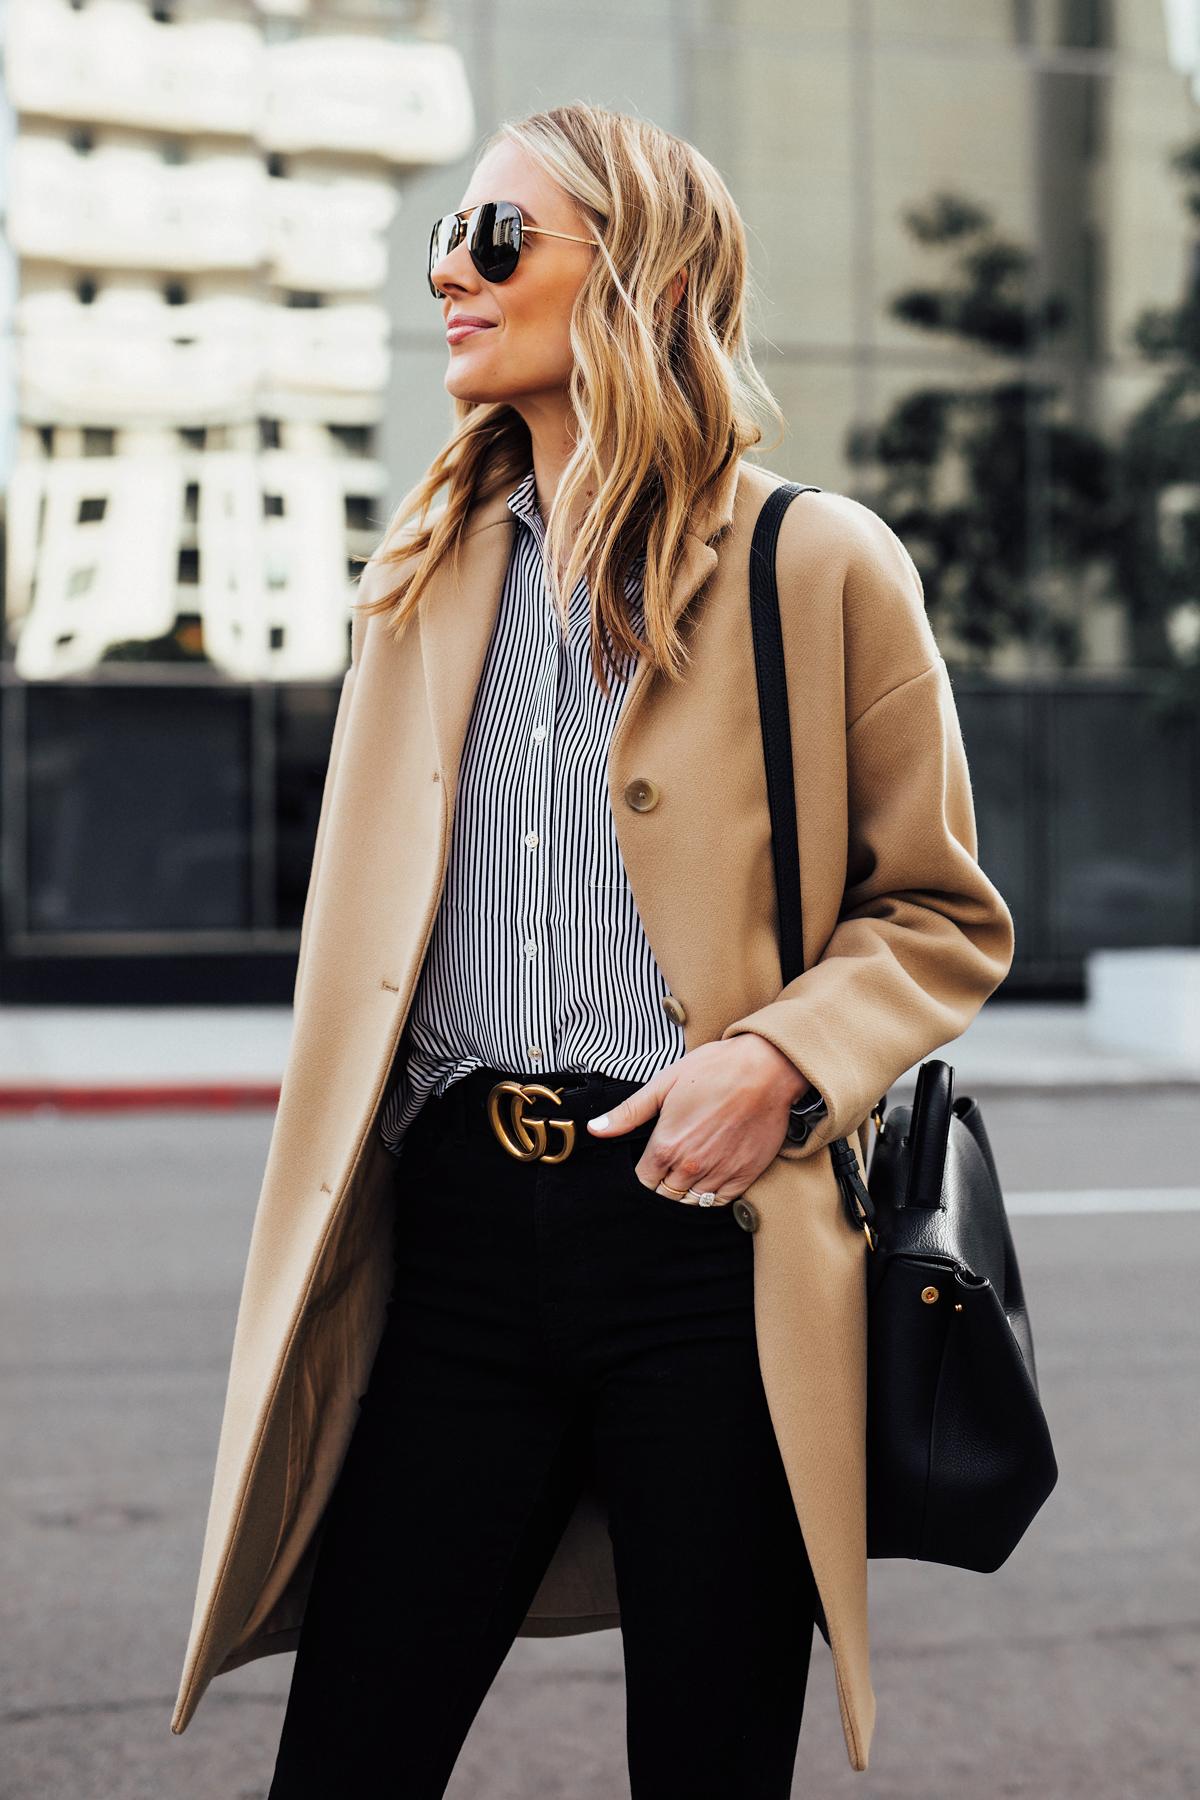 Blonde Woman Wearing Everlane Camel Coat Black White Stripe Button Down Shirt Black Skinny Jeans Black Gucci Belt Fashion Jackson San Diego Fashion Blogger Street Style